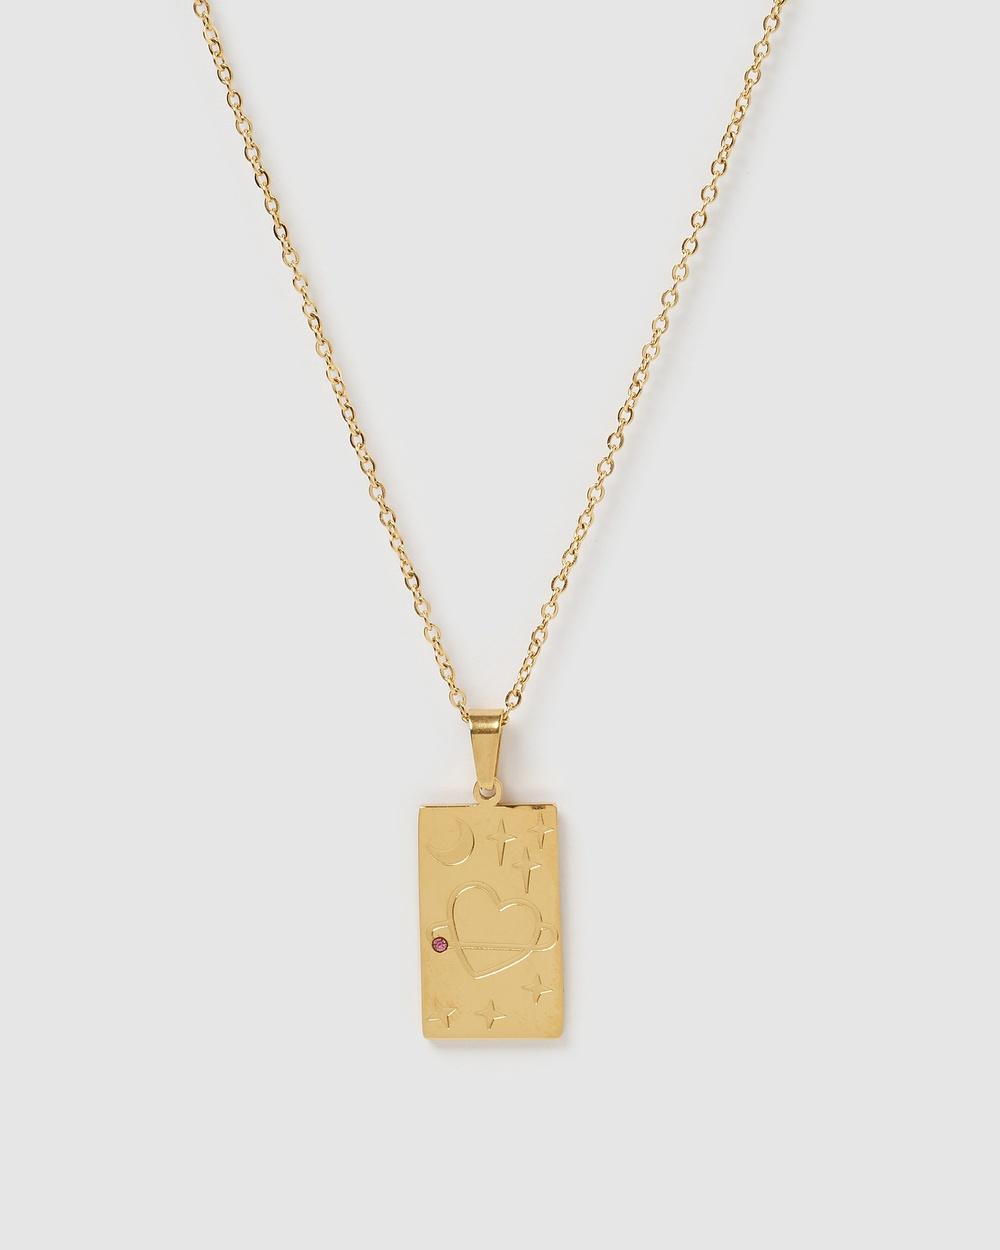 Miz Casa and Co Agnes Pendant Necklace Jewellery Gold